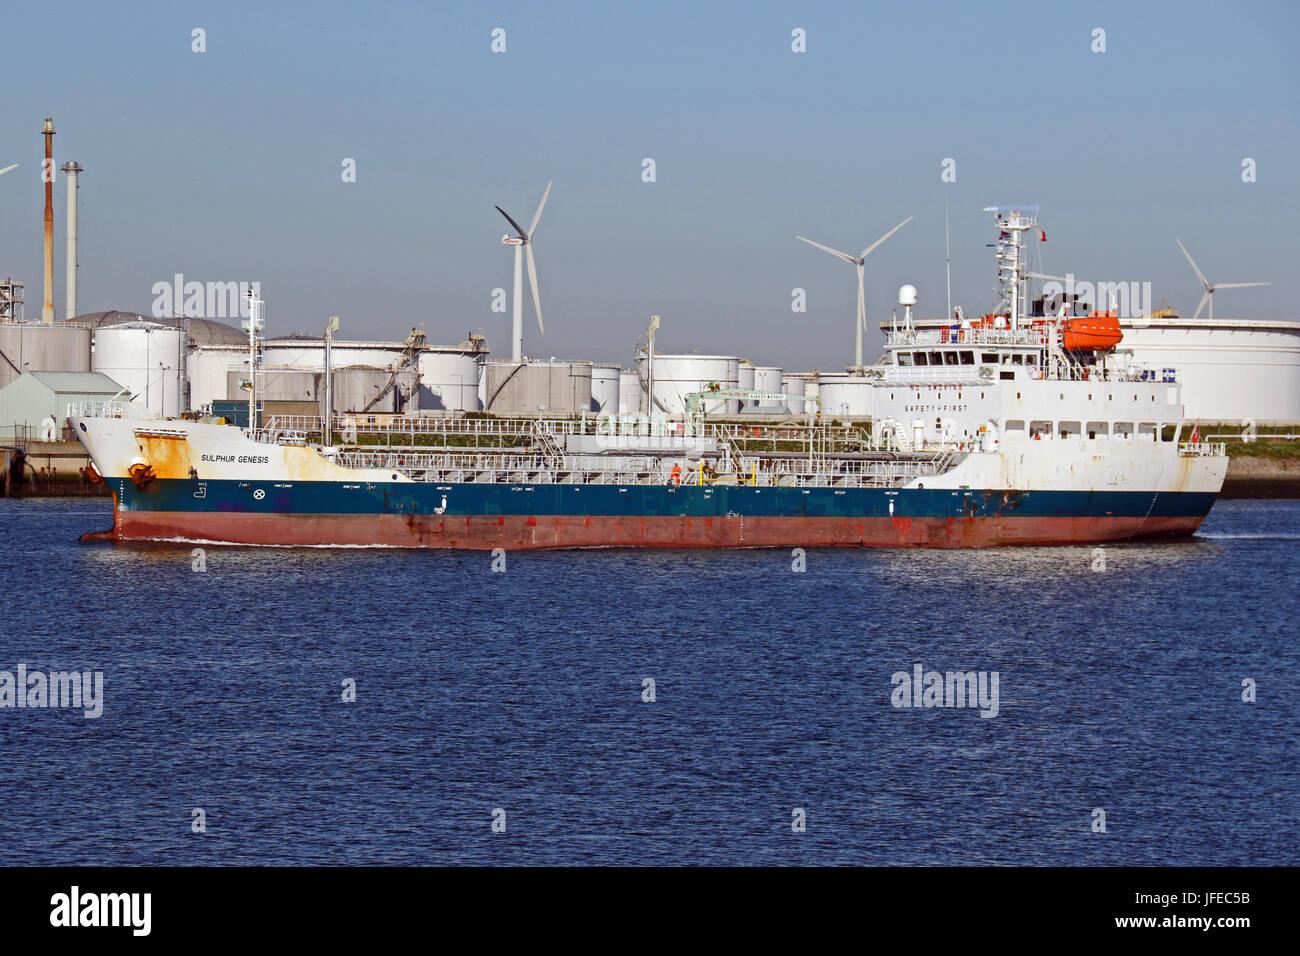 The tanker Sulphur Genesis enters the port of Rotterdam. - Stock Image